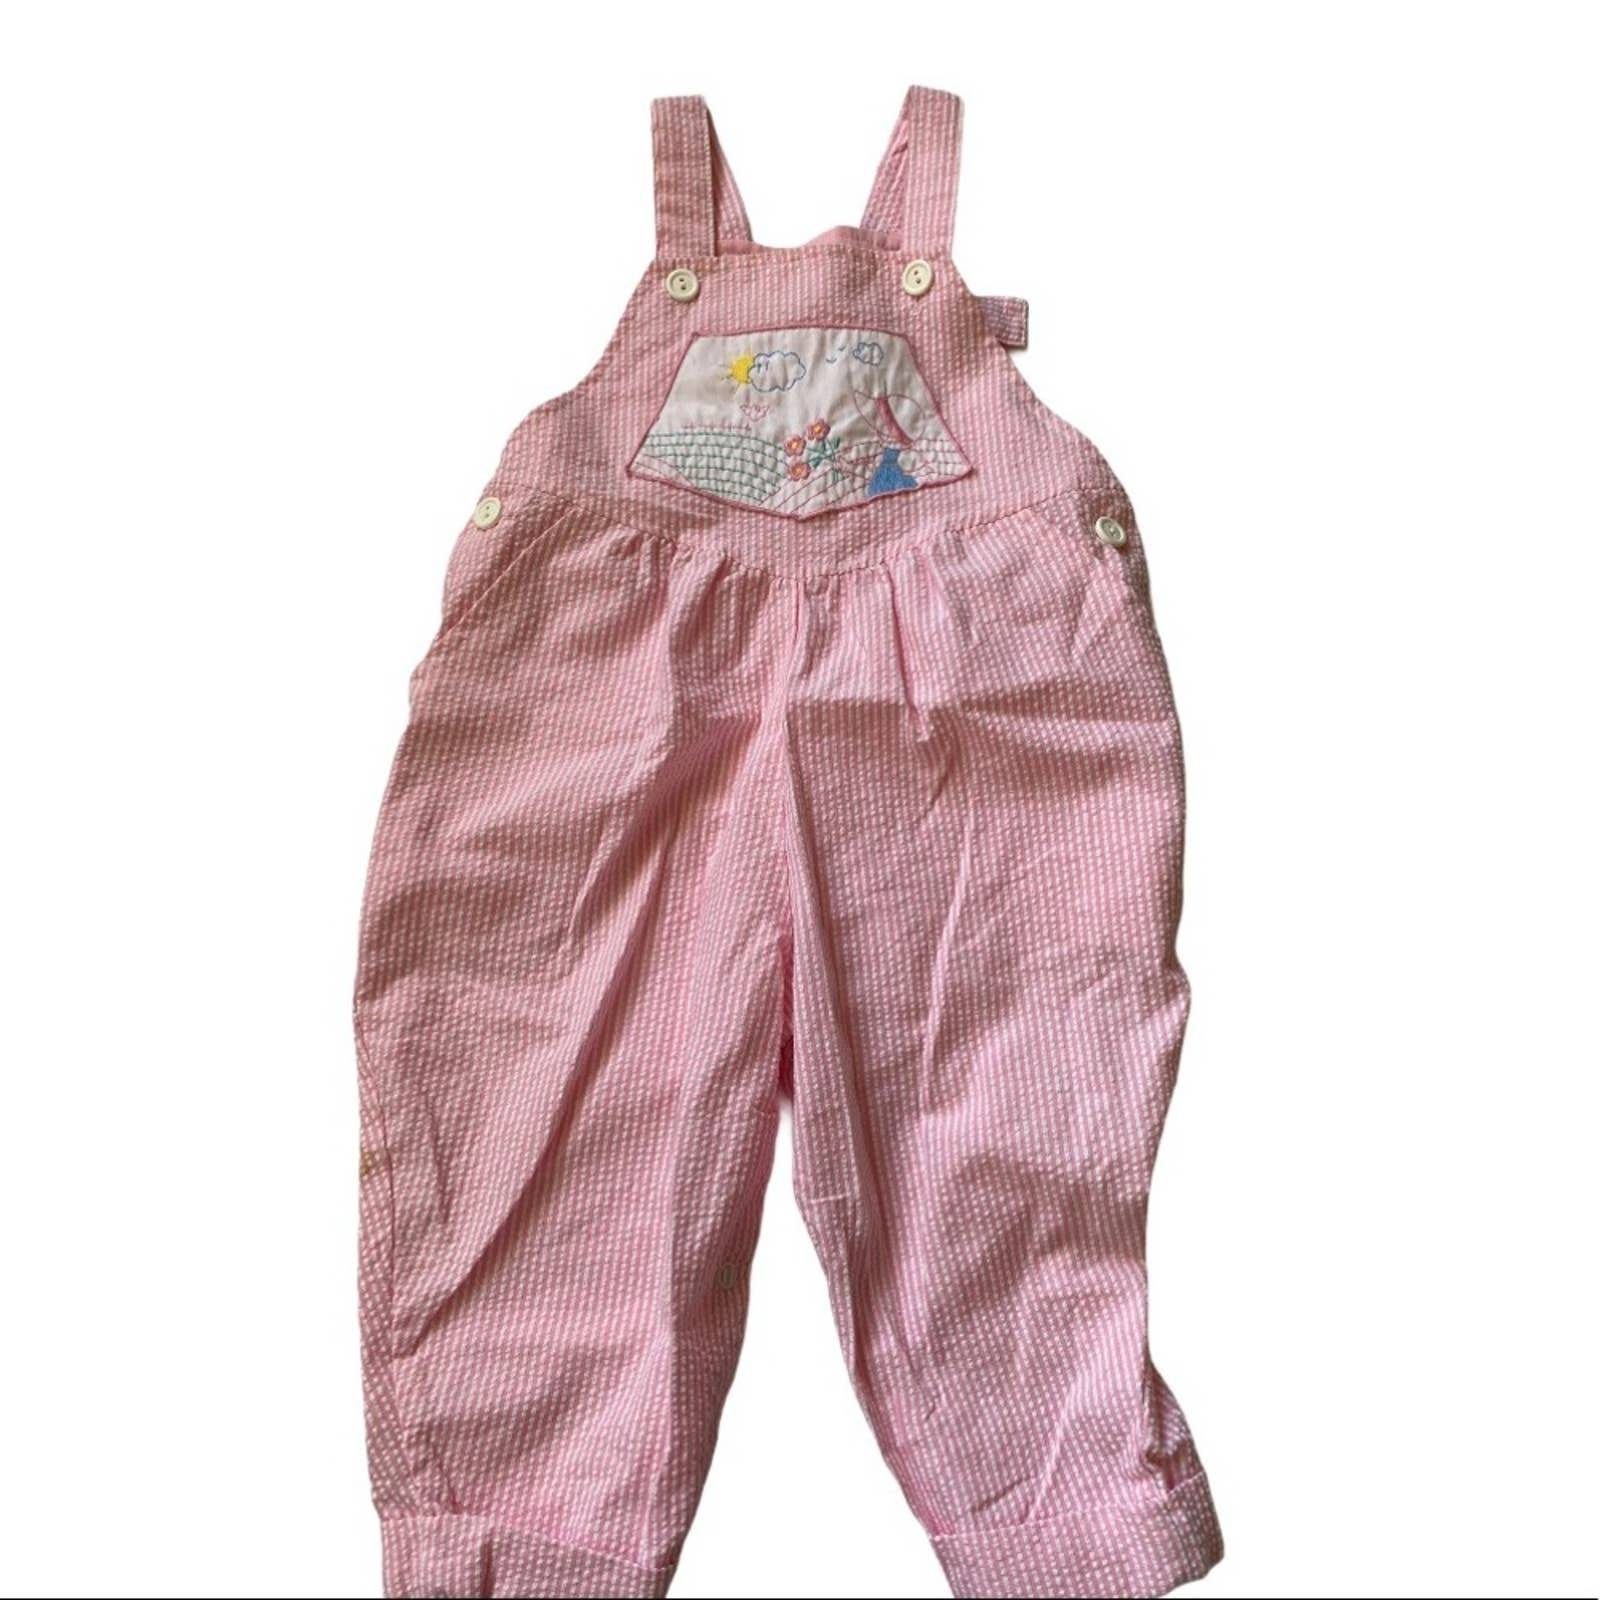 Vintage pinstripe pink overalls 18 m